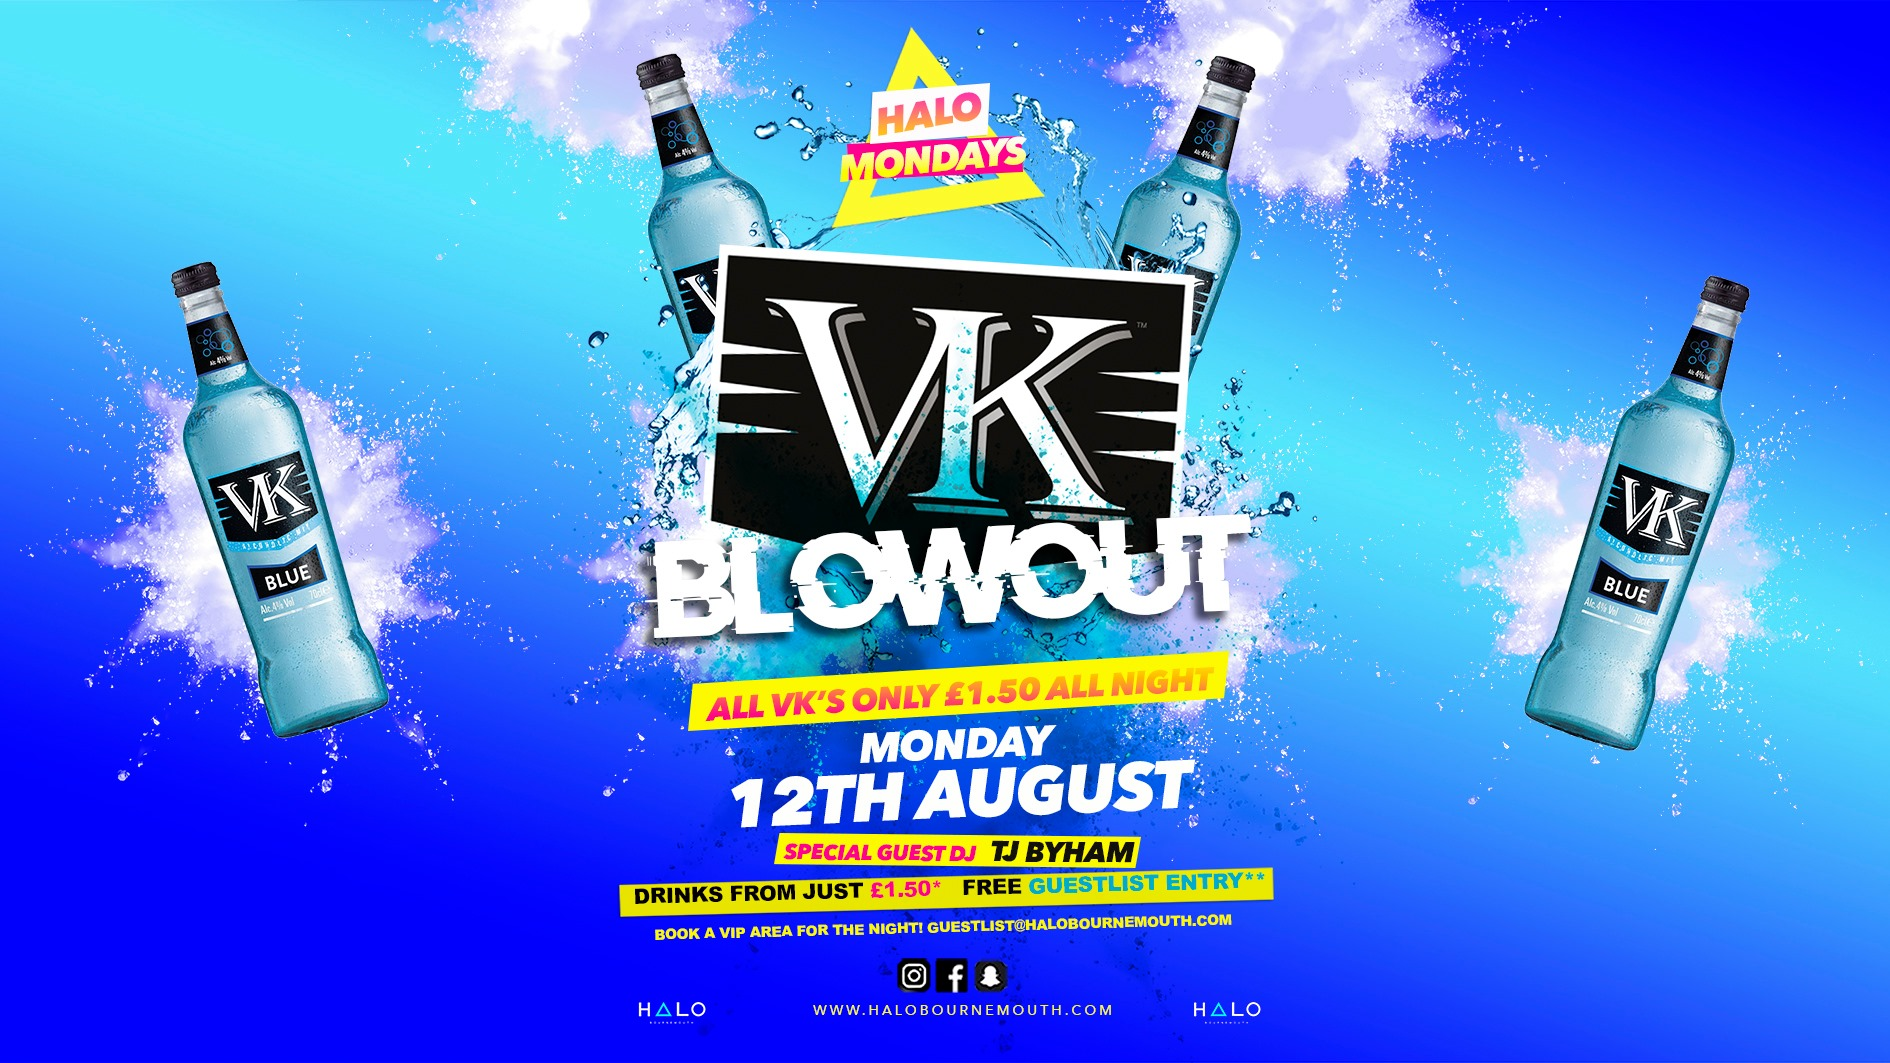 VK Blowout! 12.08.19 Halo Mondays